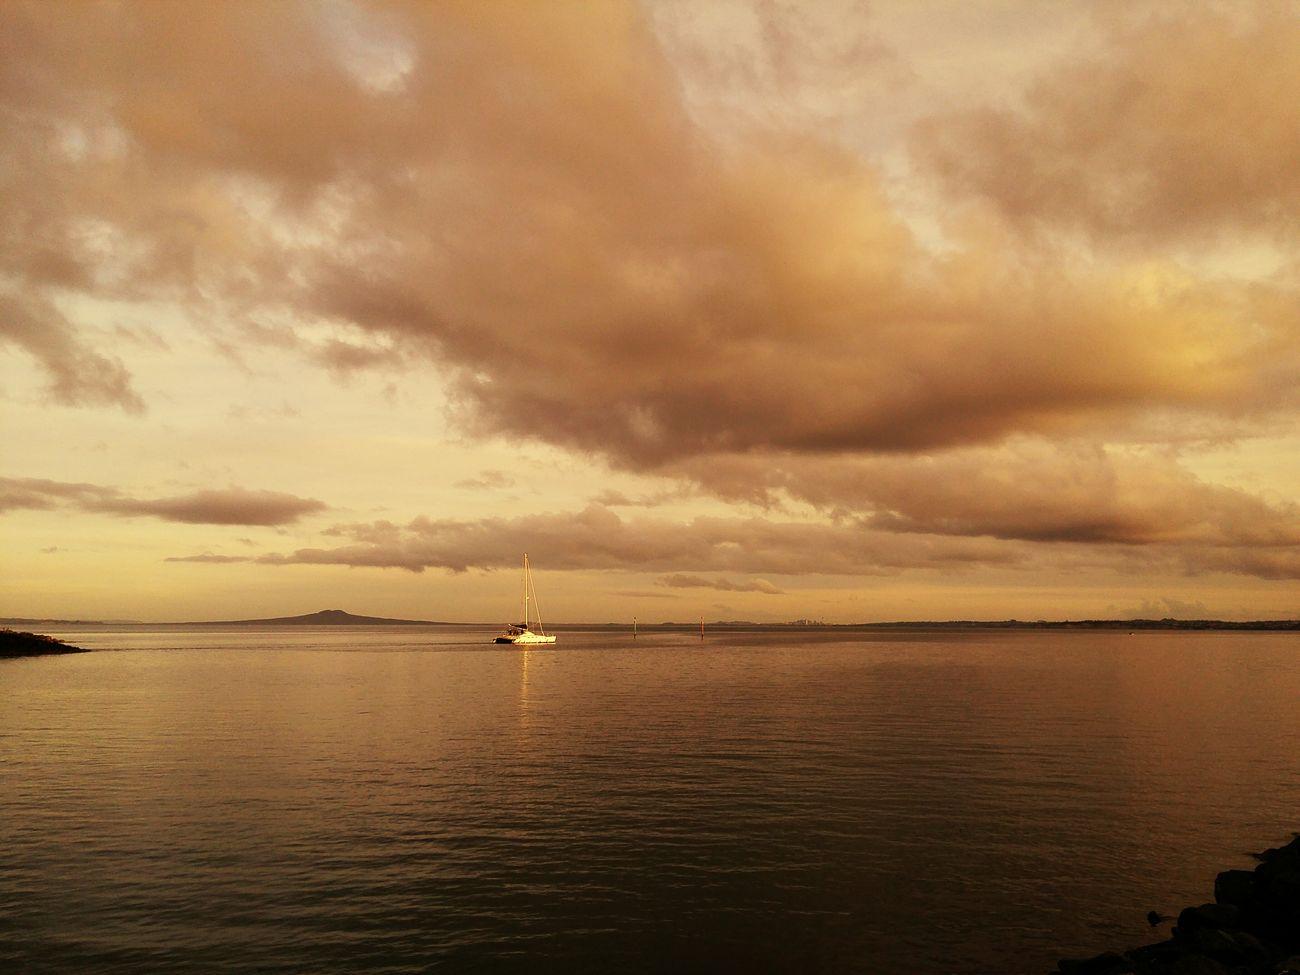 Sea Beach Yatch Sunset Vocano SuparGusCollection